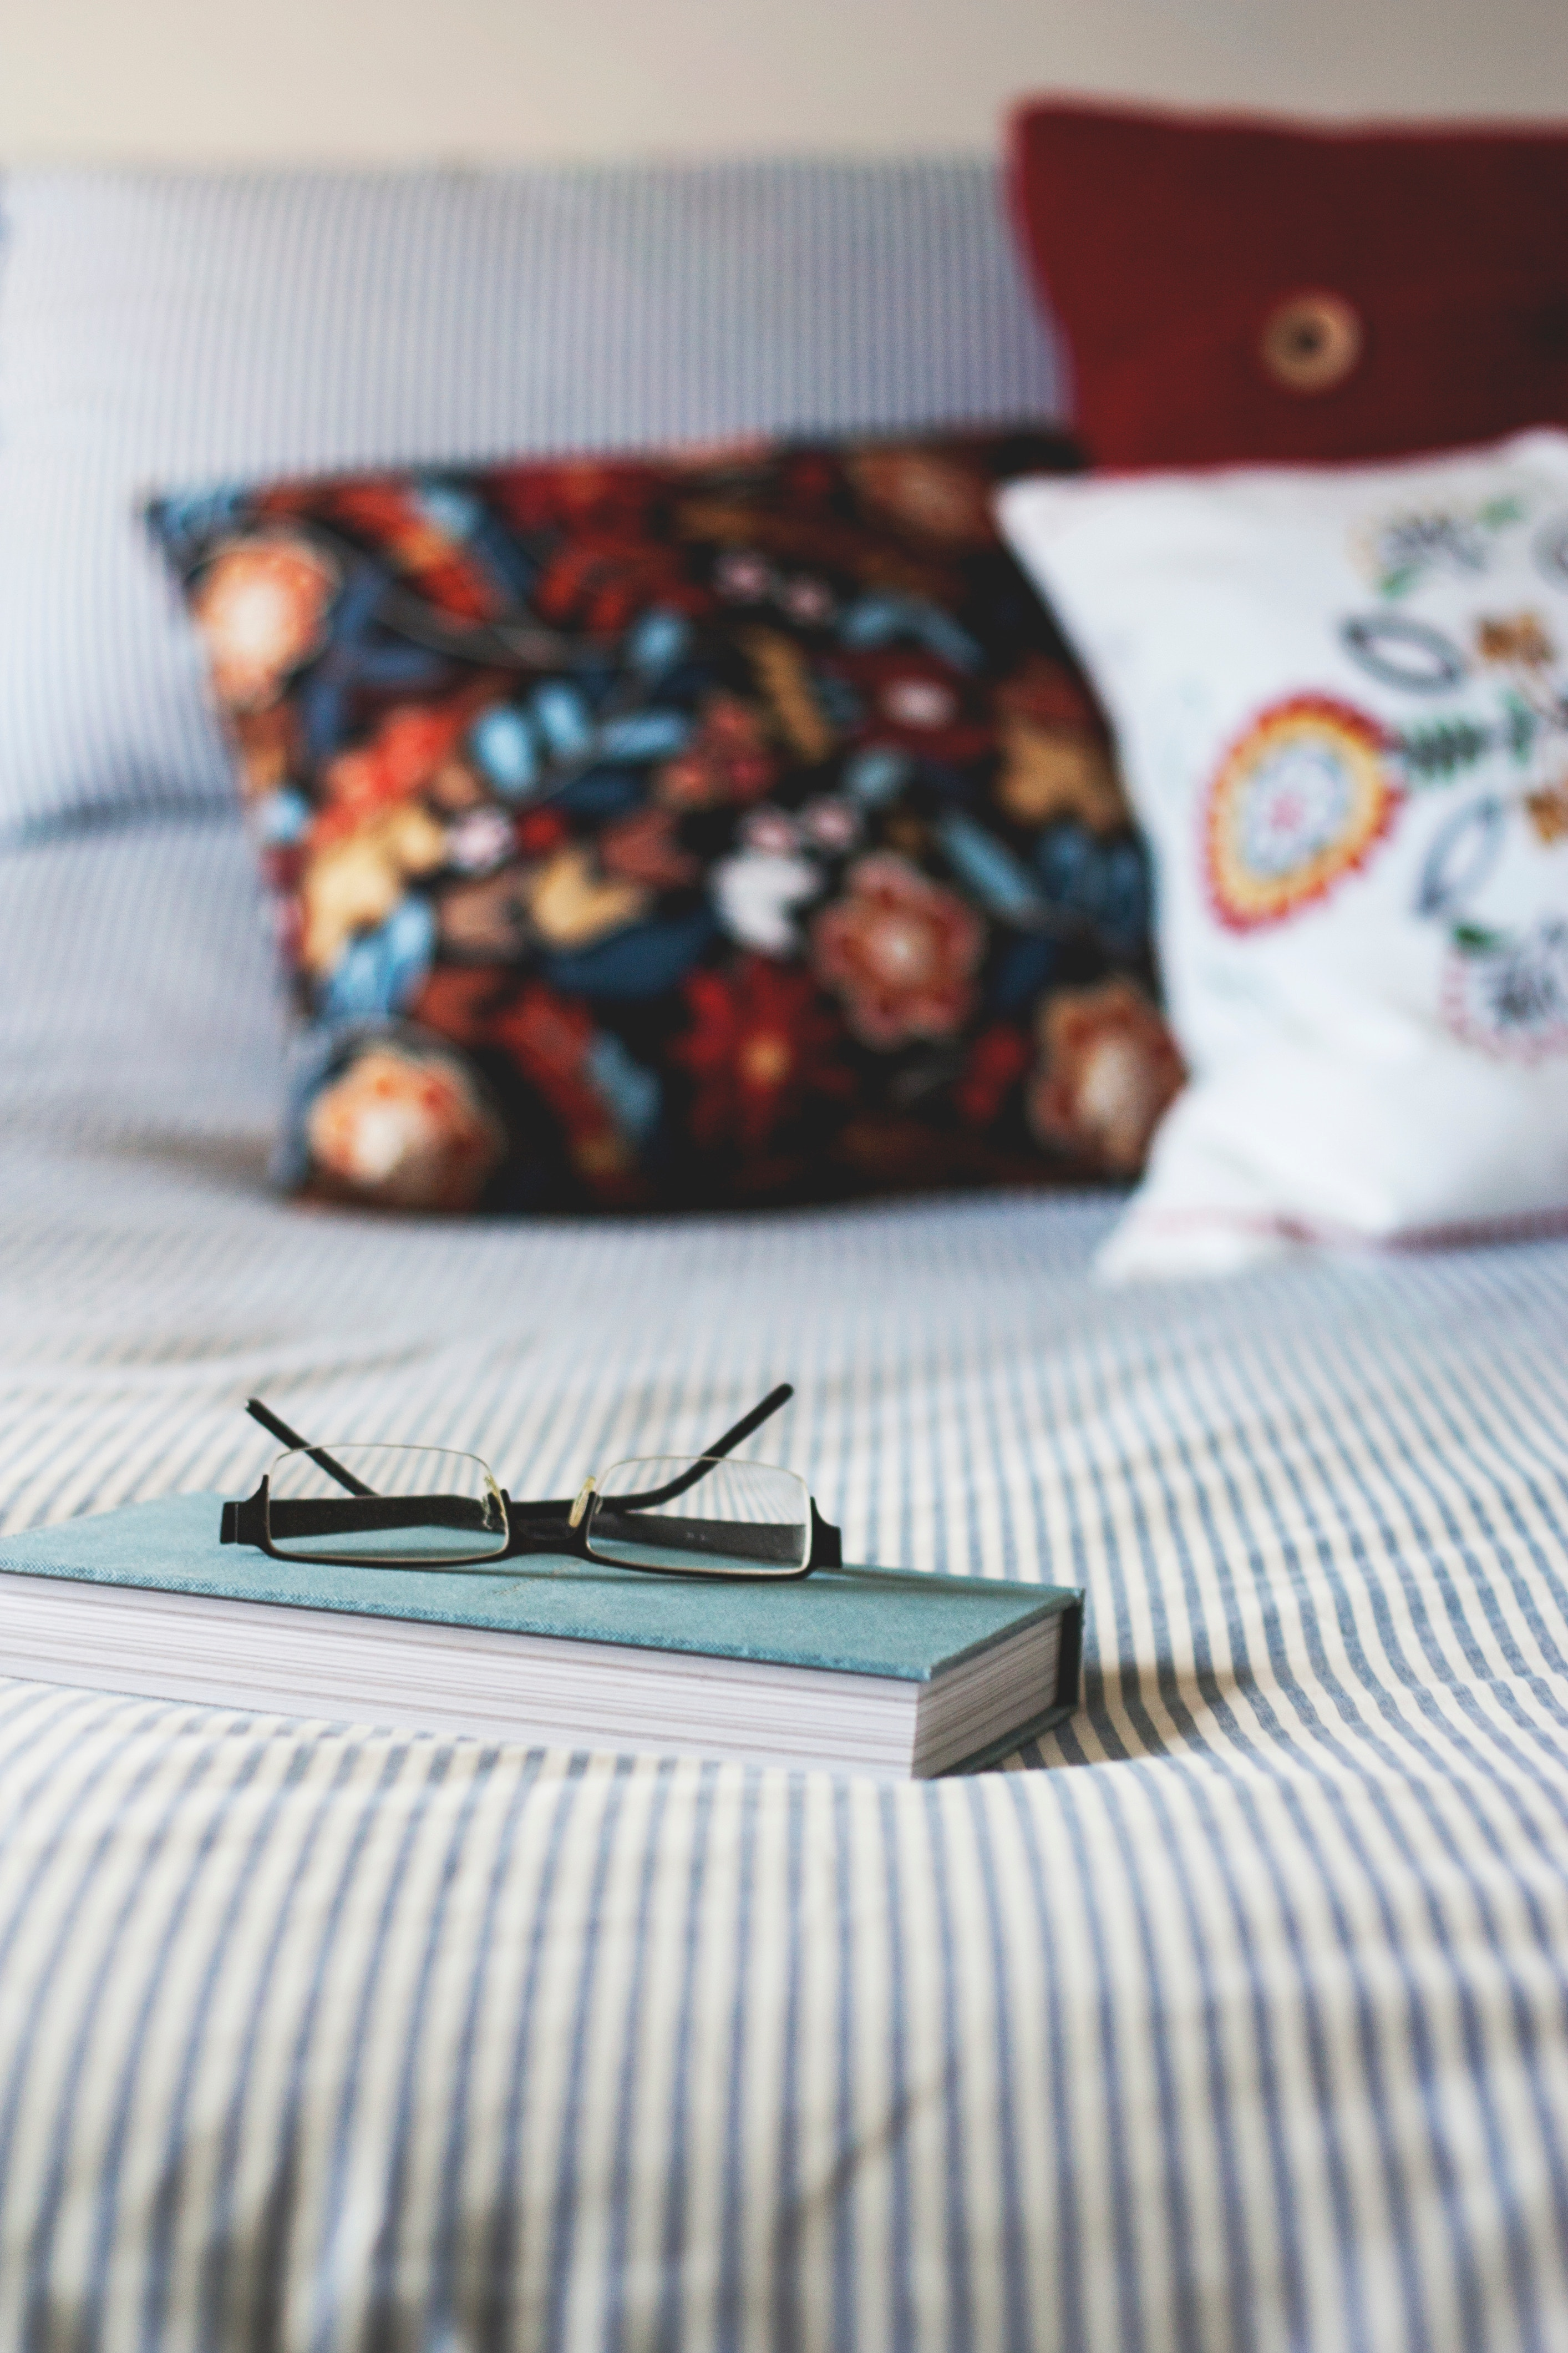 Catch More Zzzzs - Sleep Hygiene - Latch onto Health